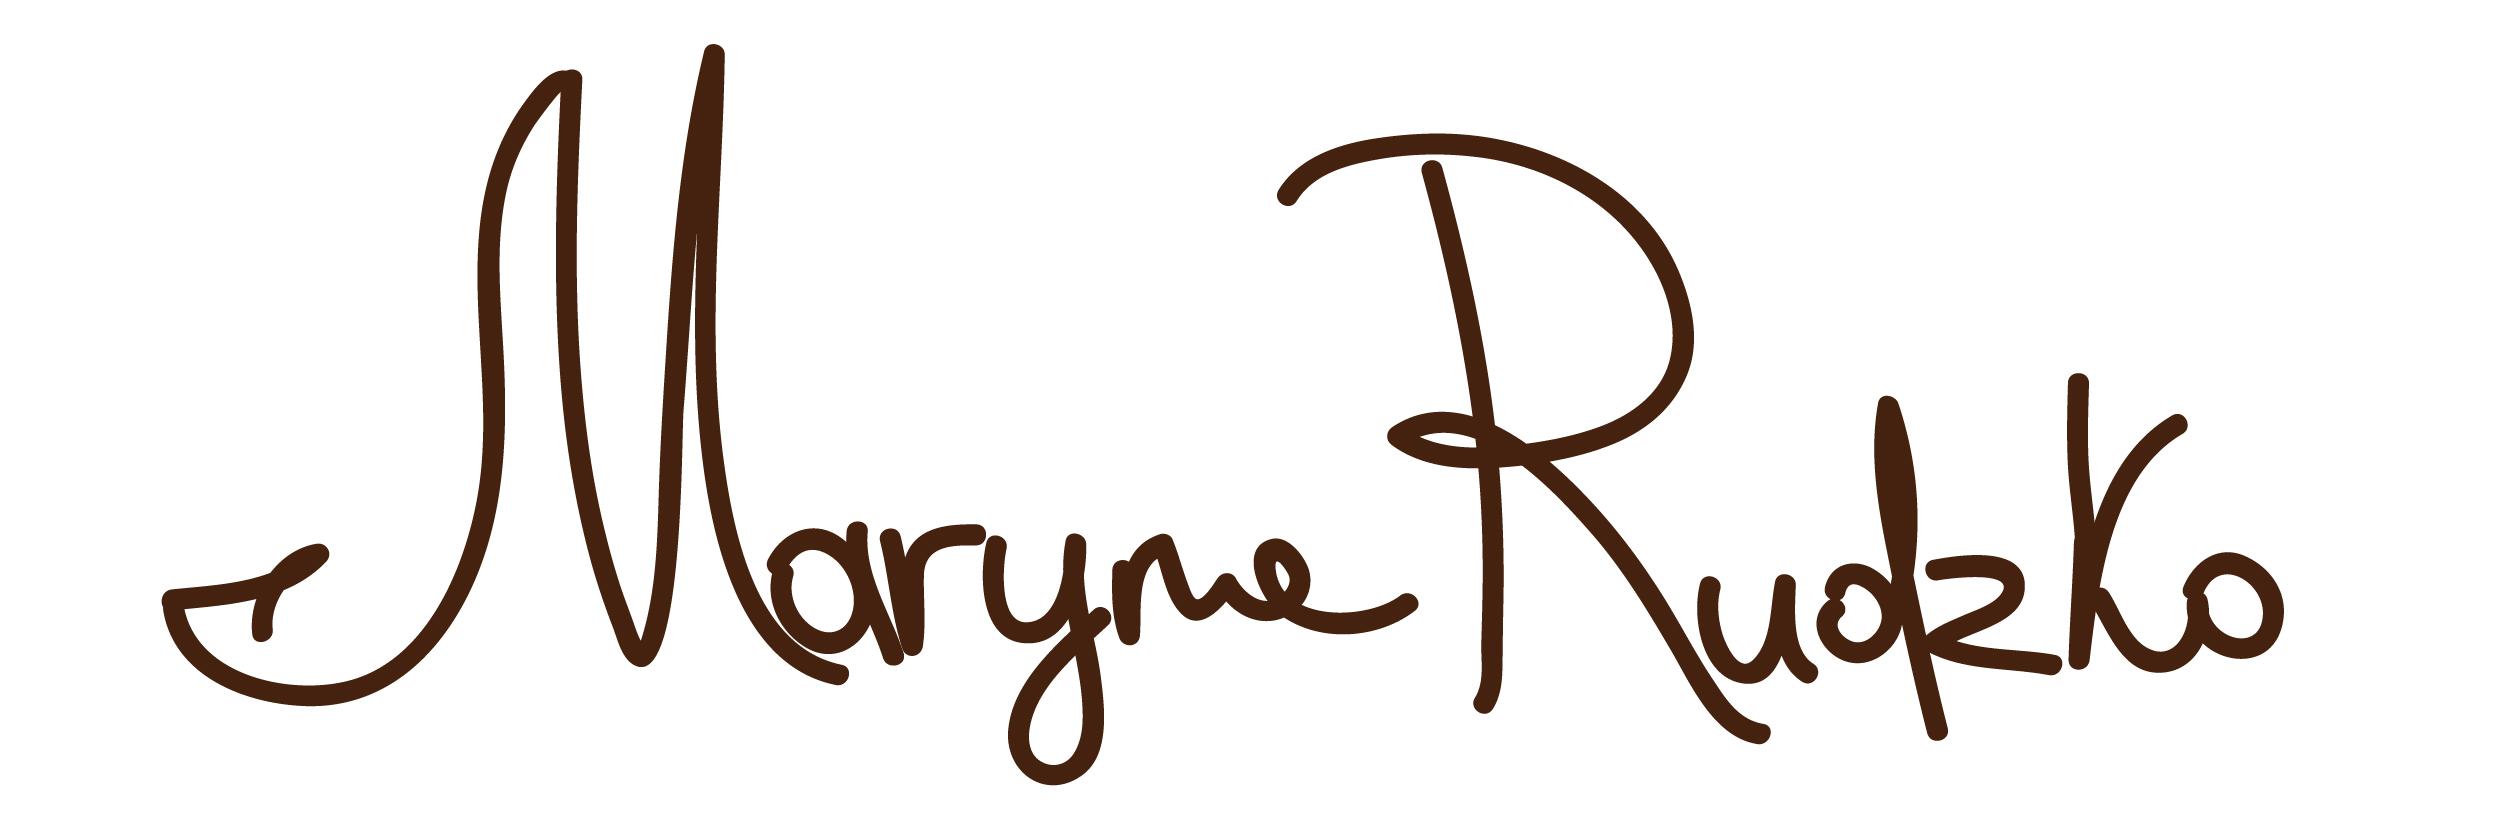 Maryna Rudzko's Signature